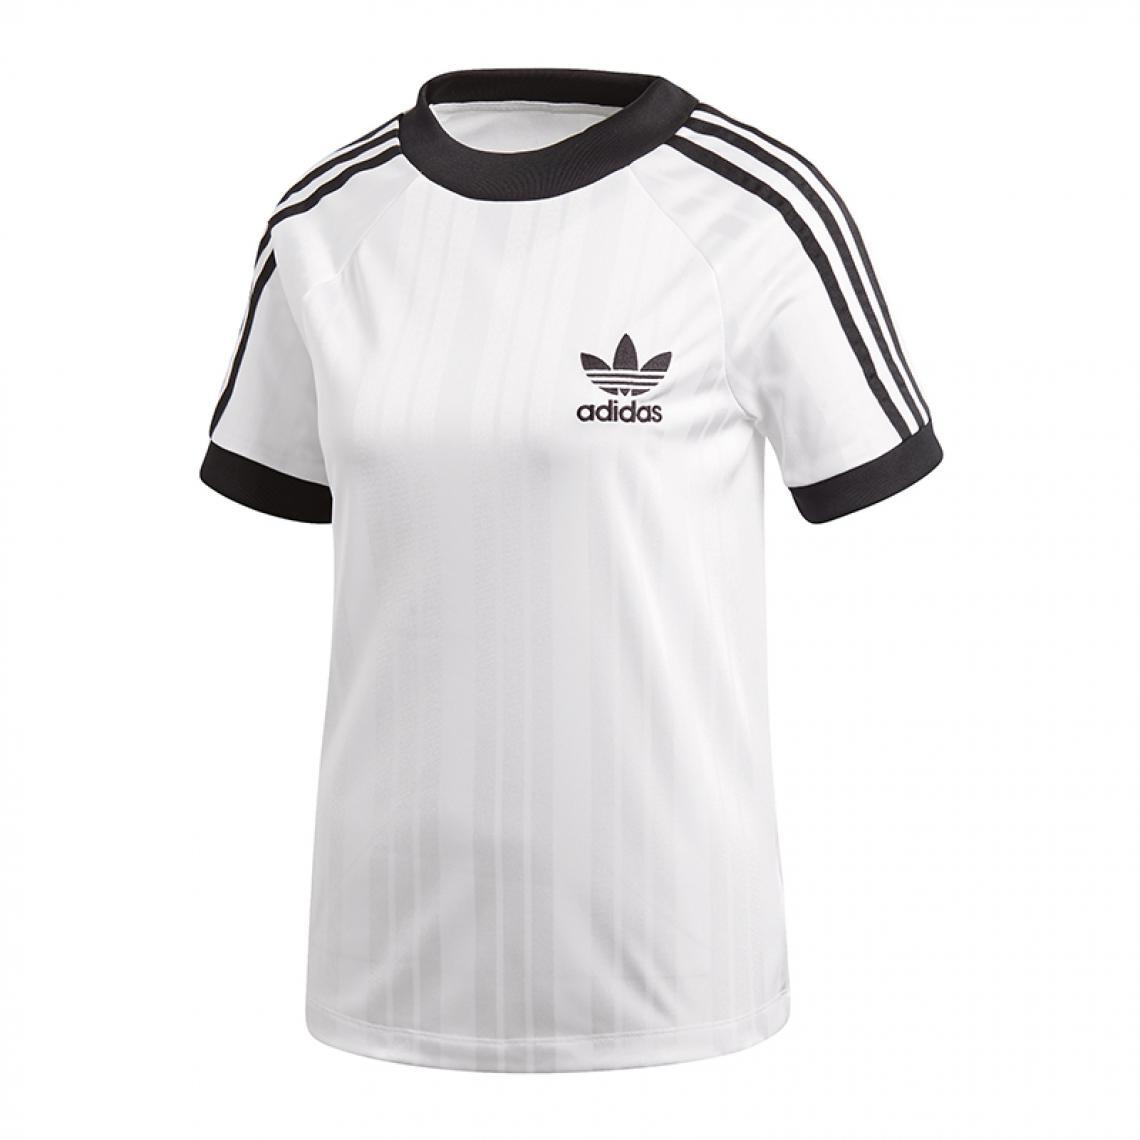 Tee shirt manches courtes SC FootB femme adidas Originals